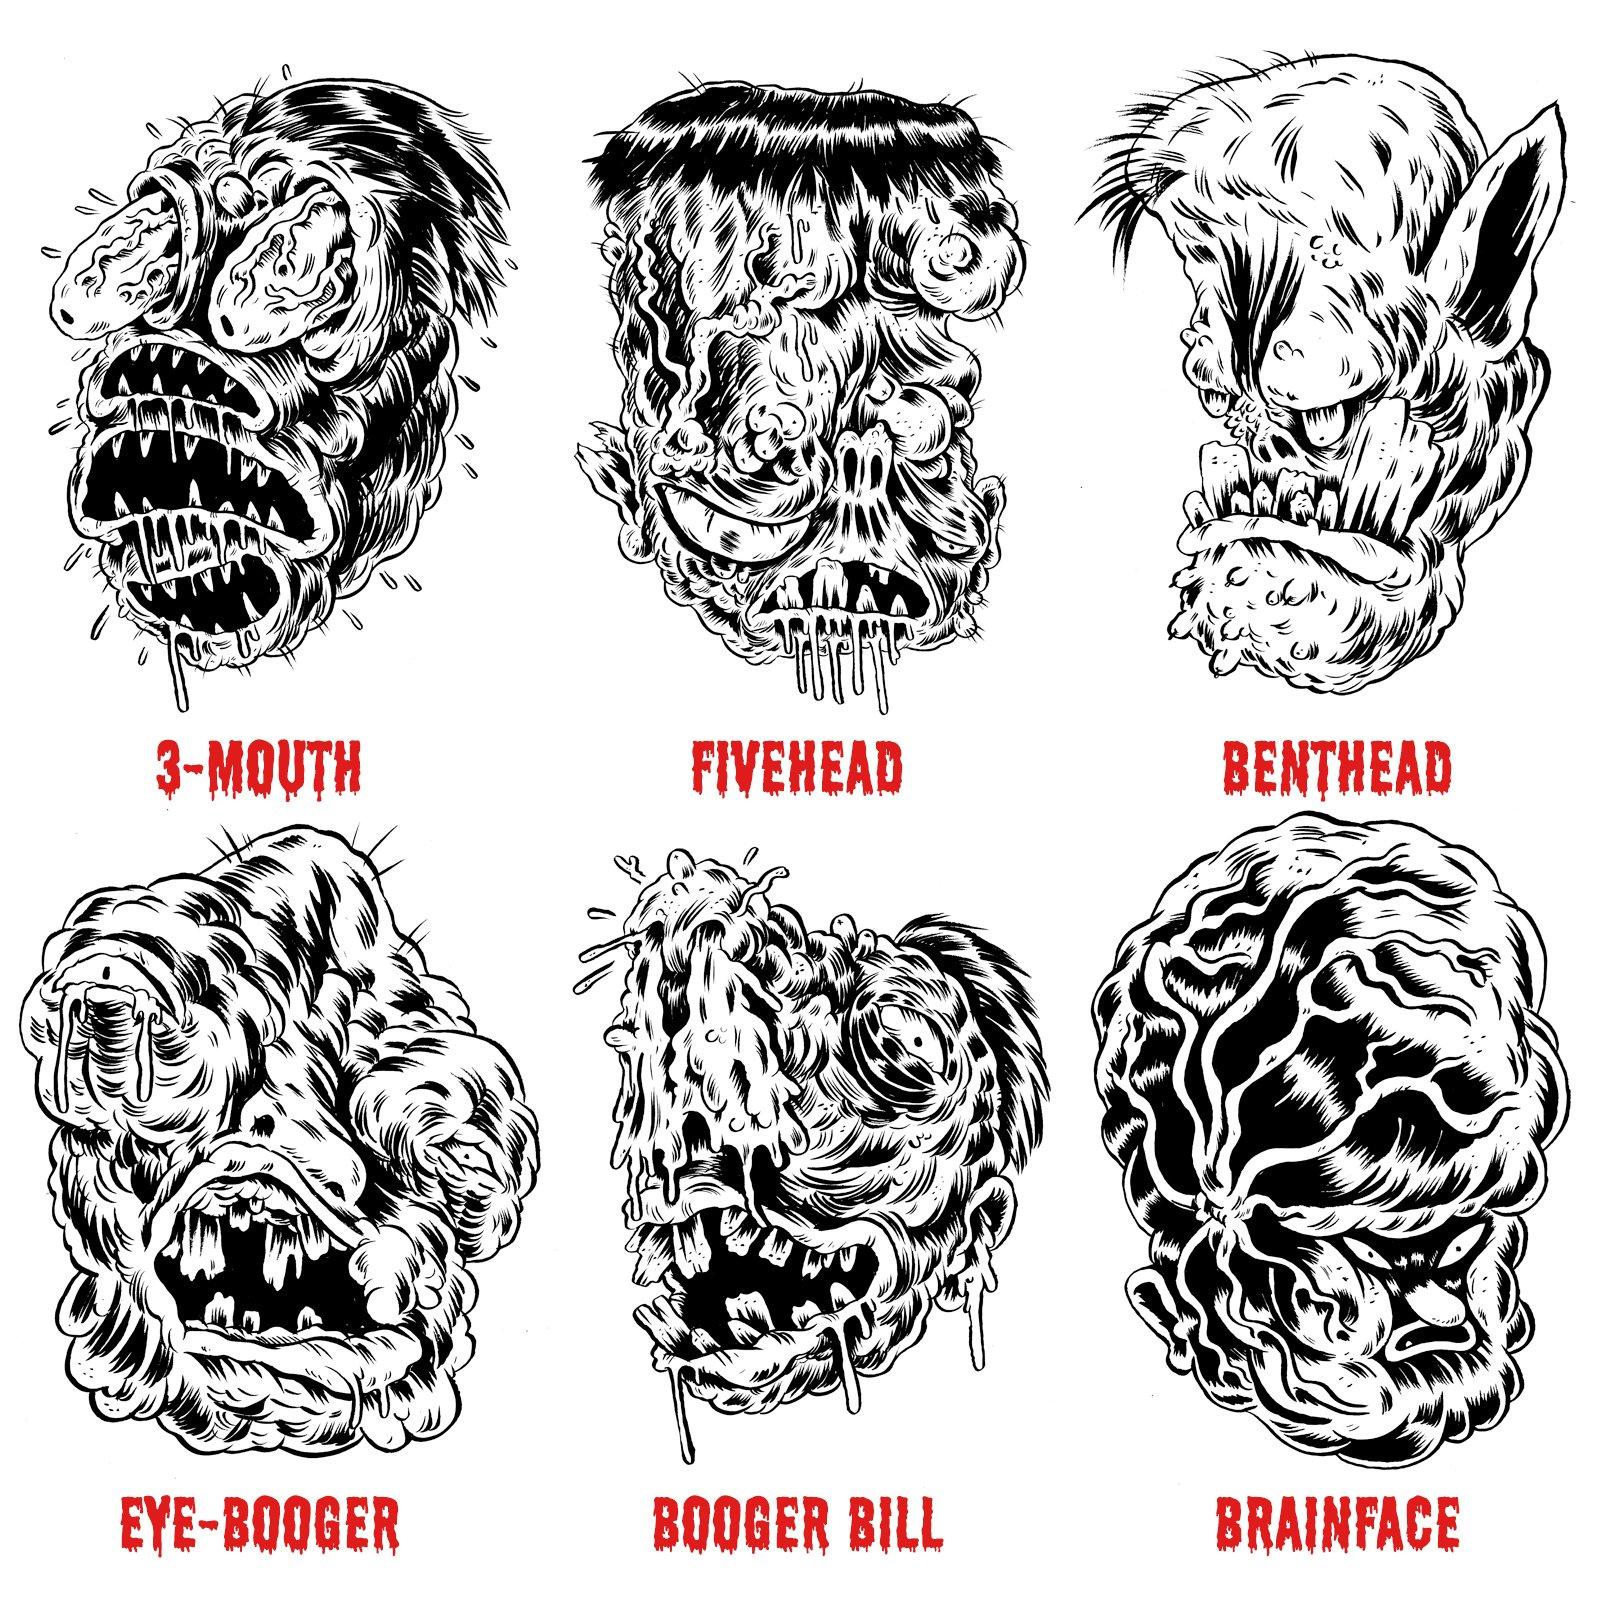 Original Ugs, Fugs, and Grossos Ink Drawings